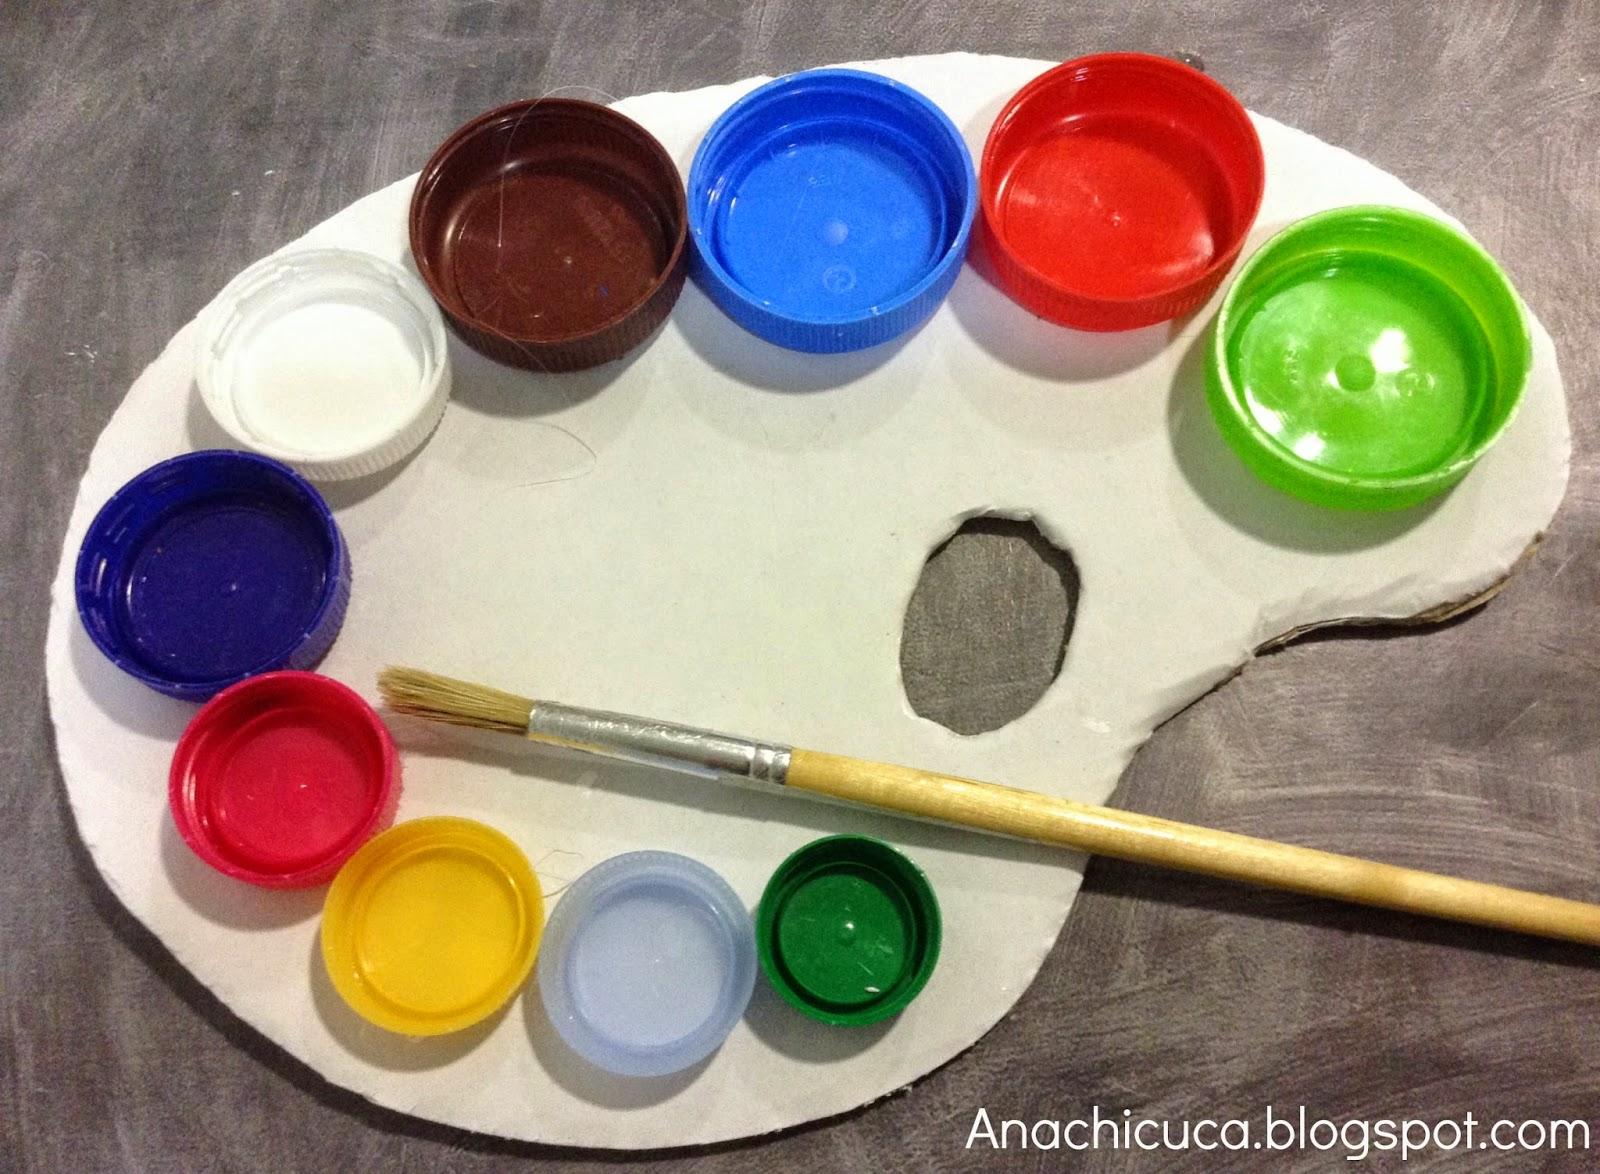 Anachicuca paleta de pintor diogenera - Paleta de pinturas ...